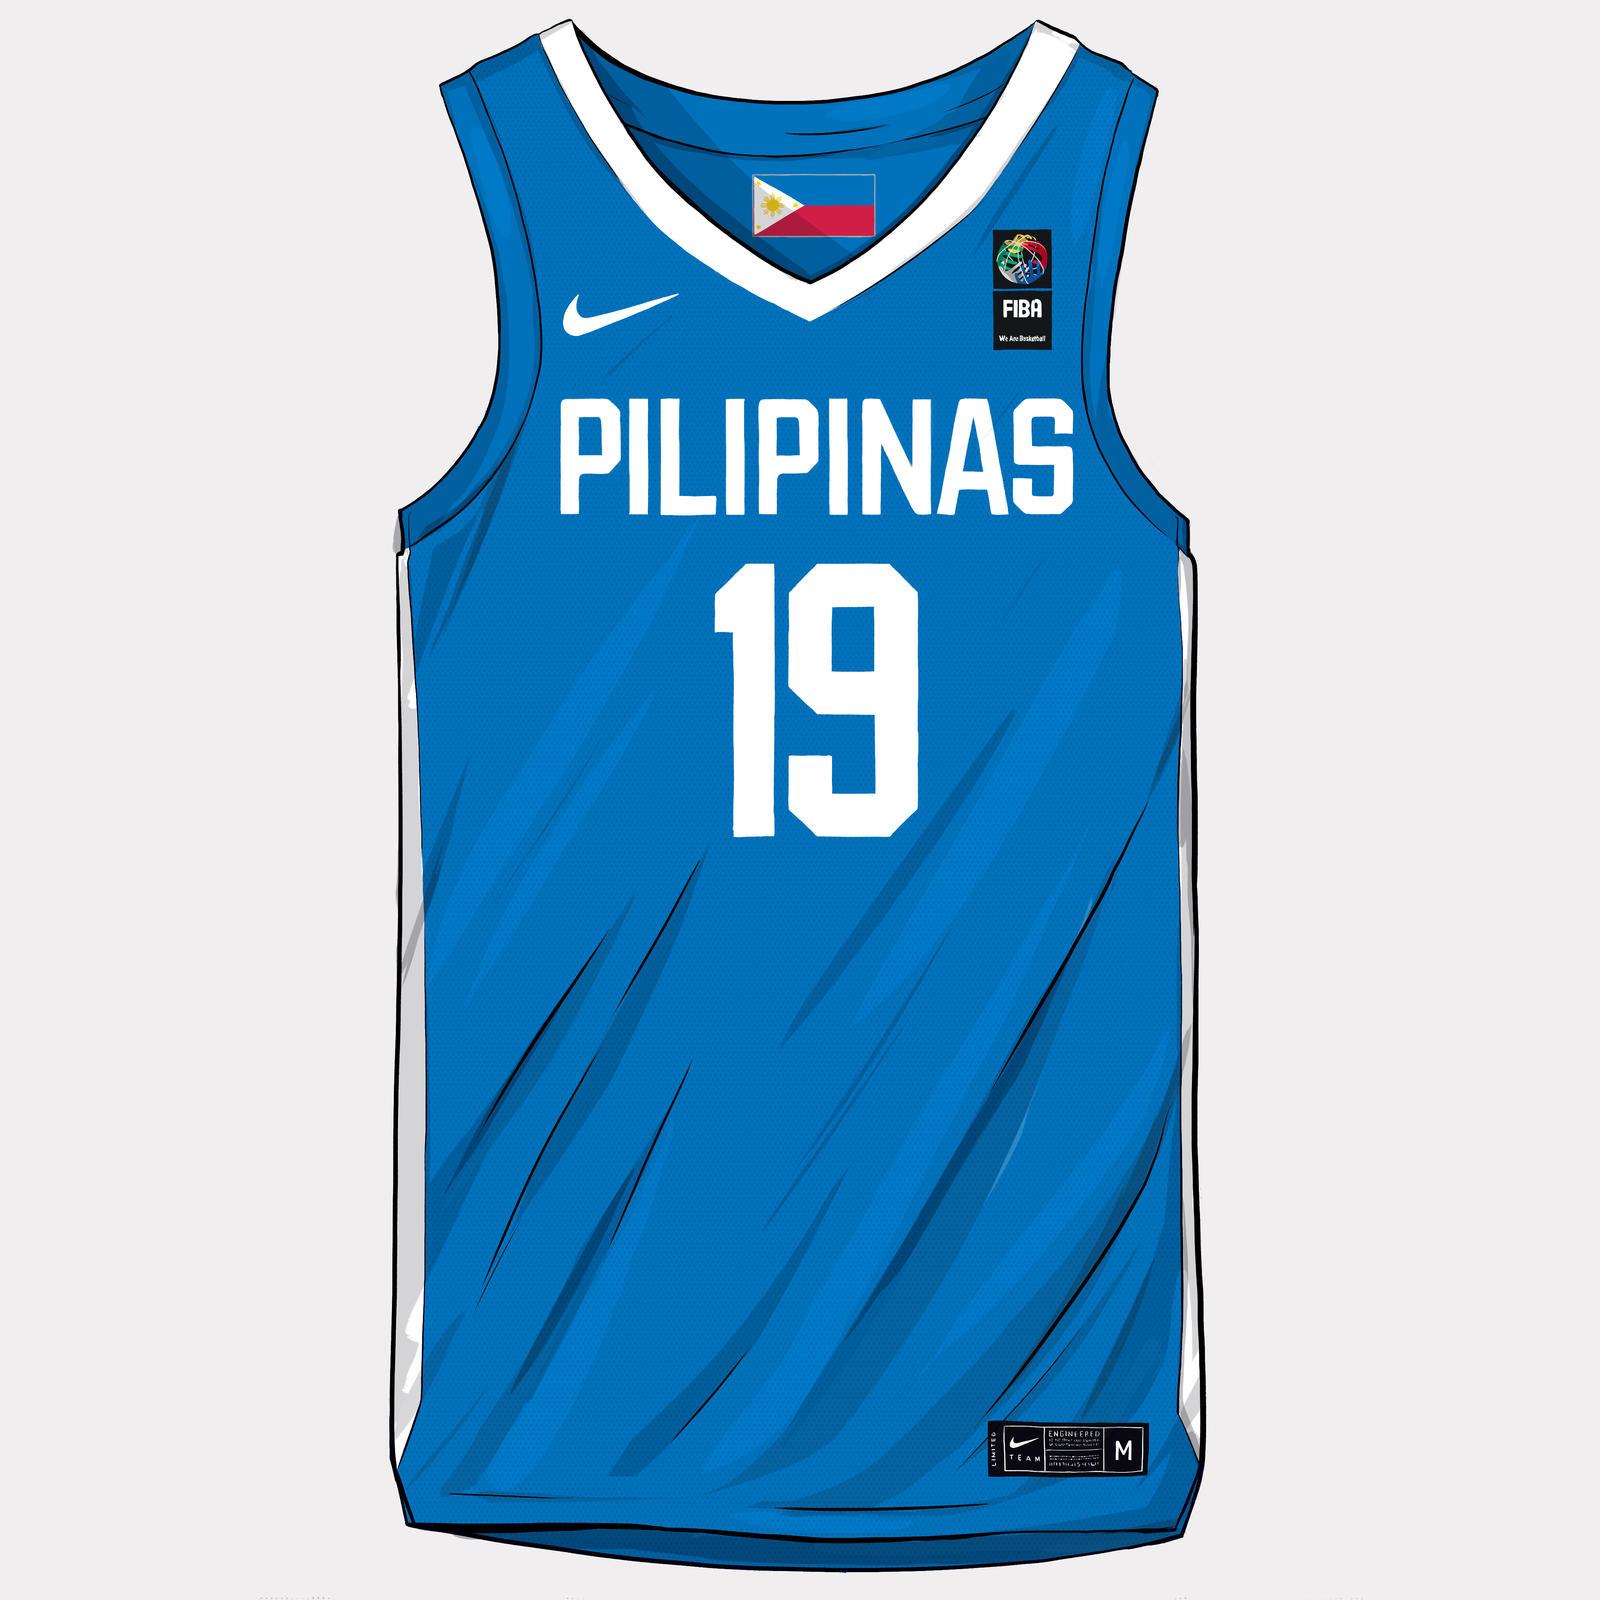 nike-news-philippines-national-team-kit-2019-illustration-1x1_1_square_1600.jpg